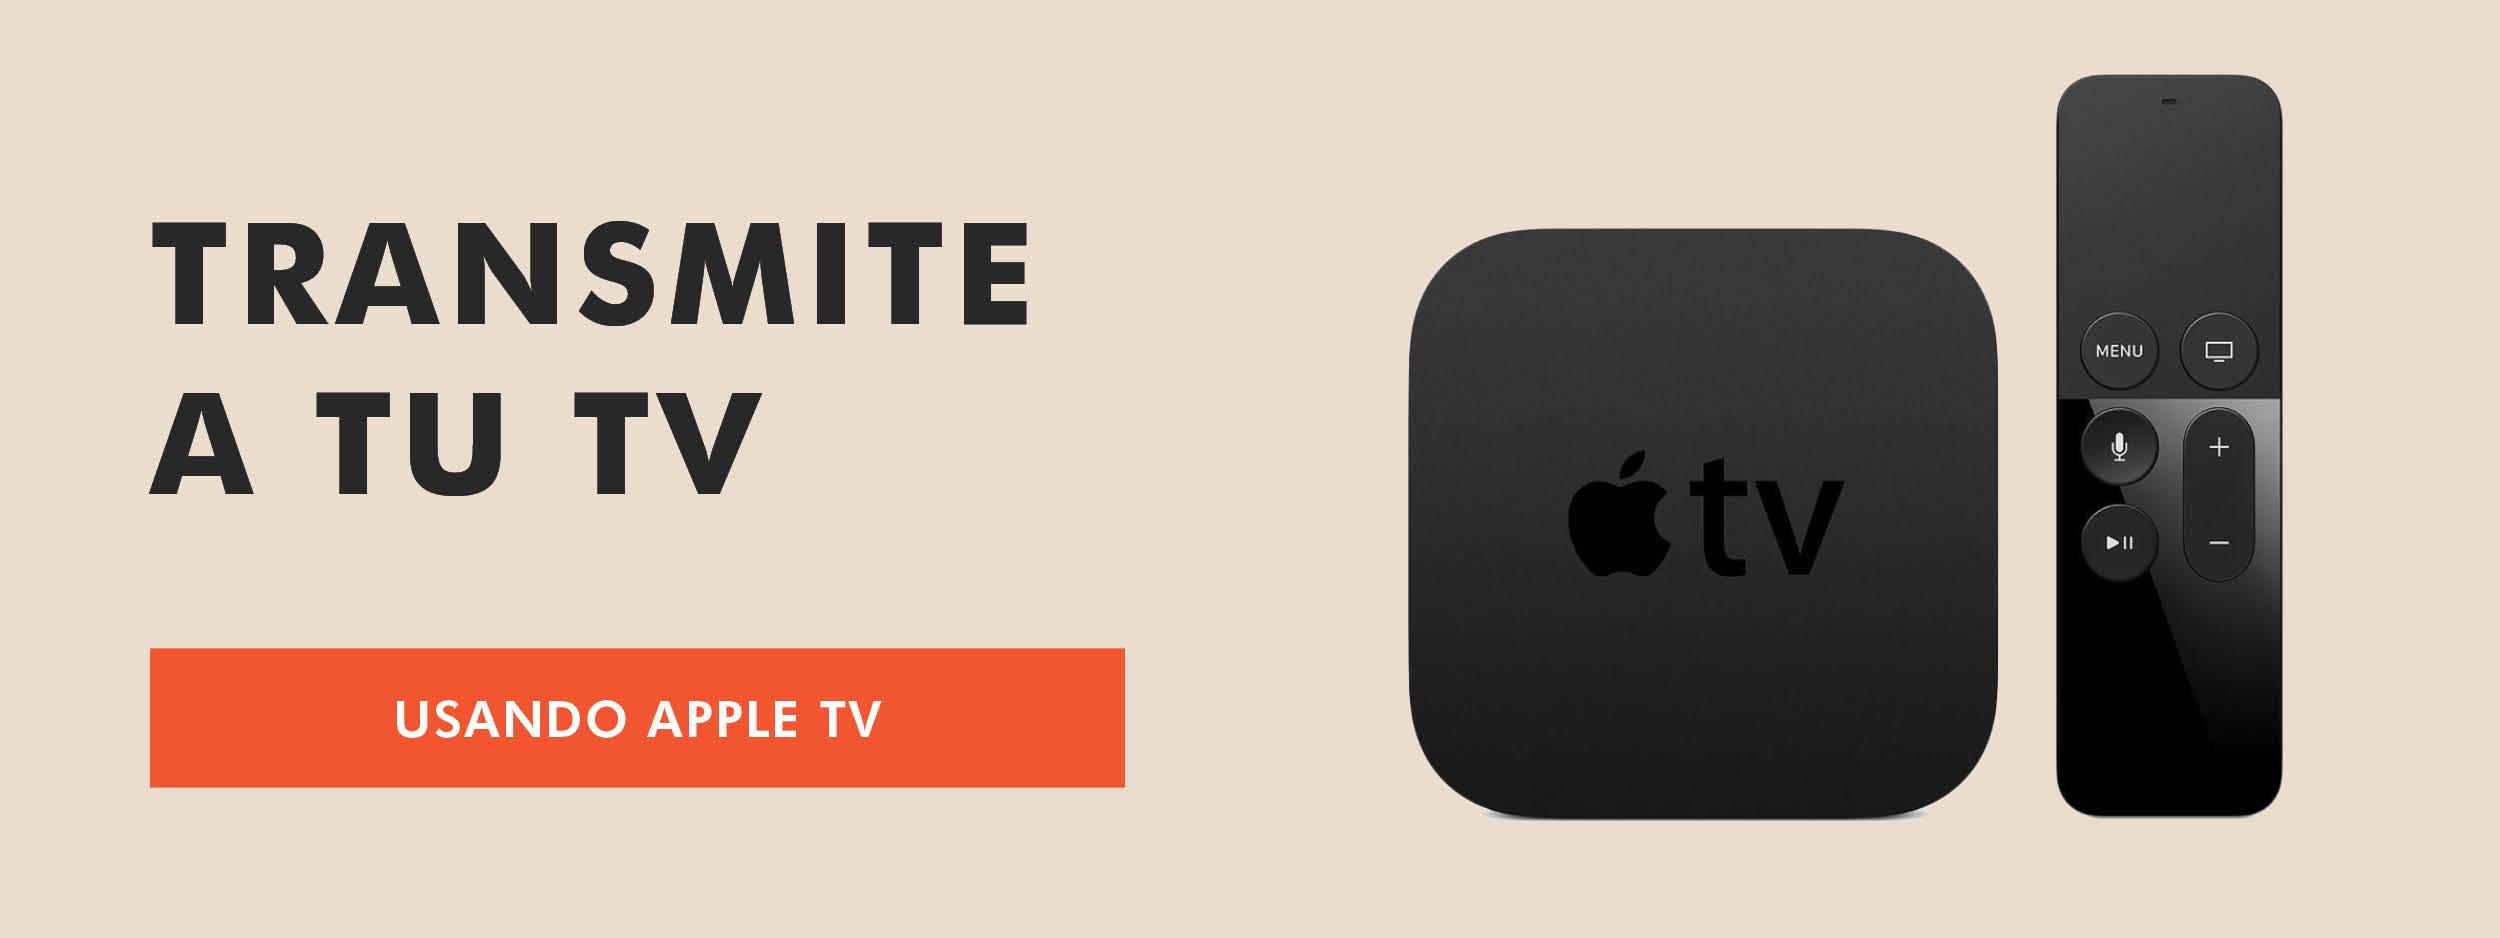 Transmitir usando un Apple TV